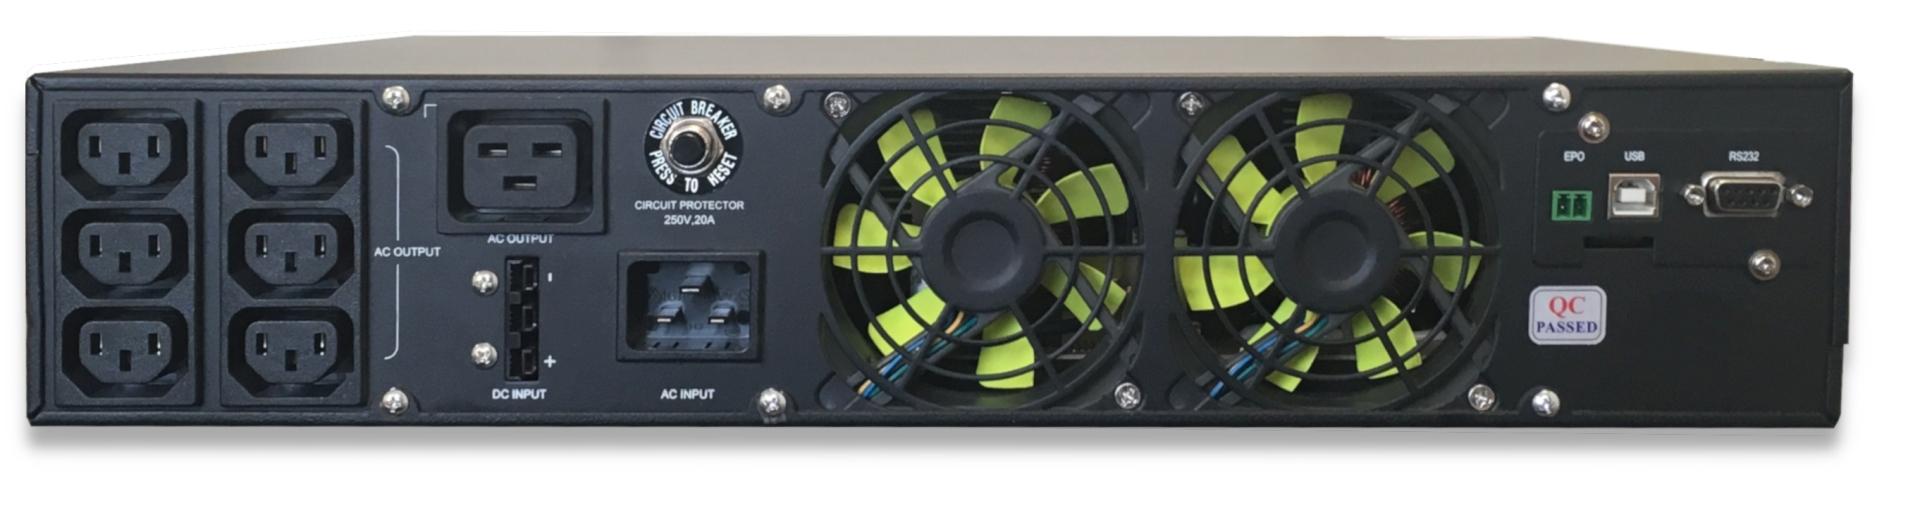 AG1500S ReGenerator Rear Panel